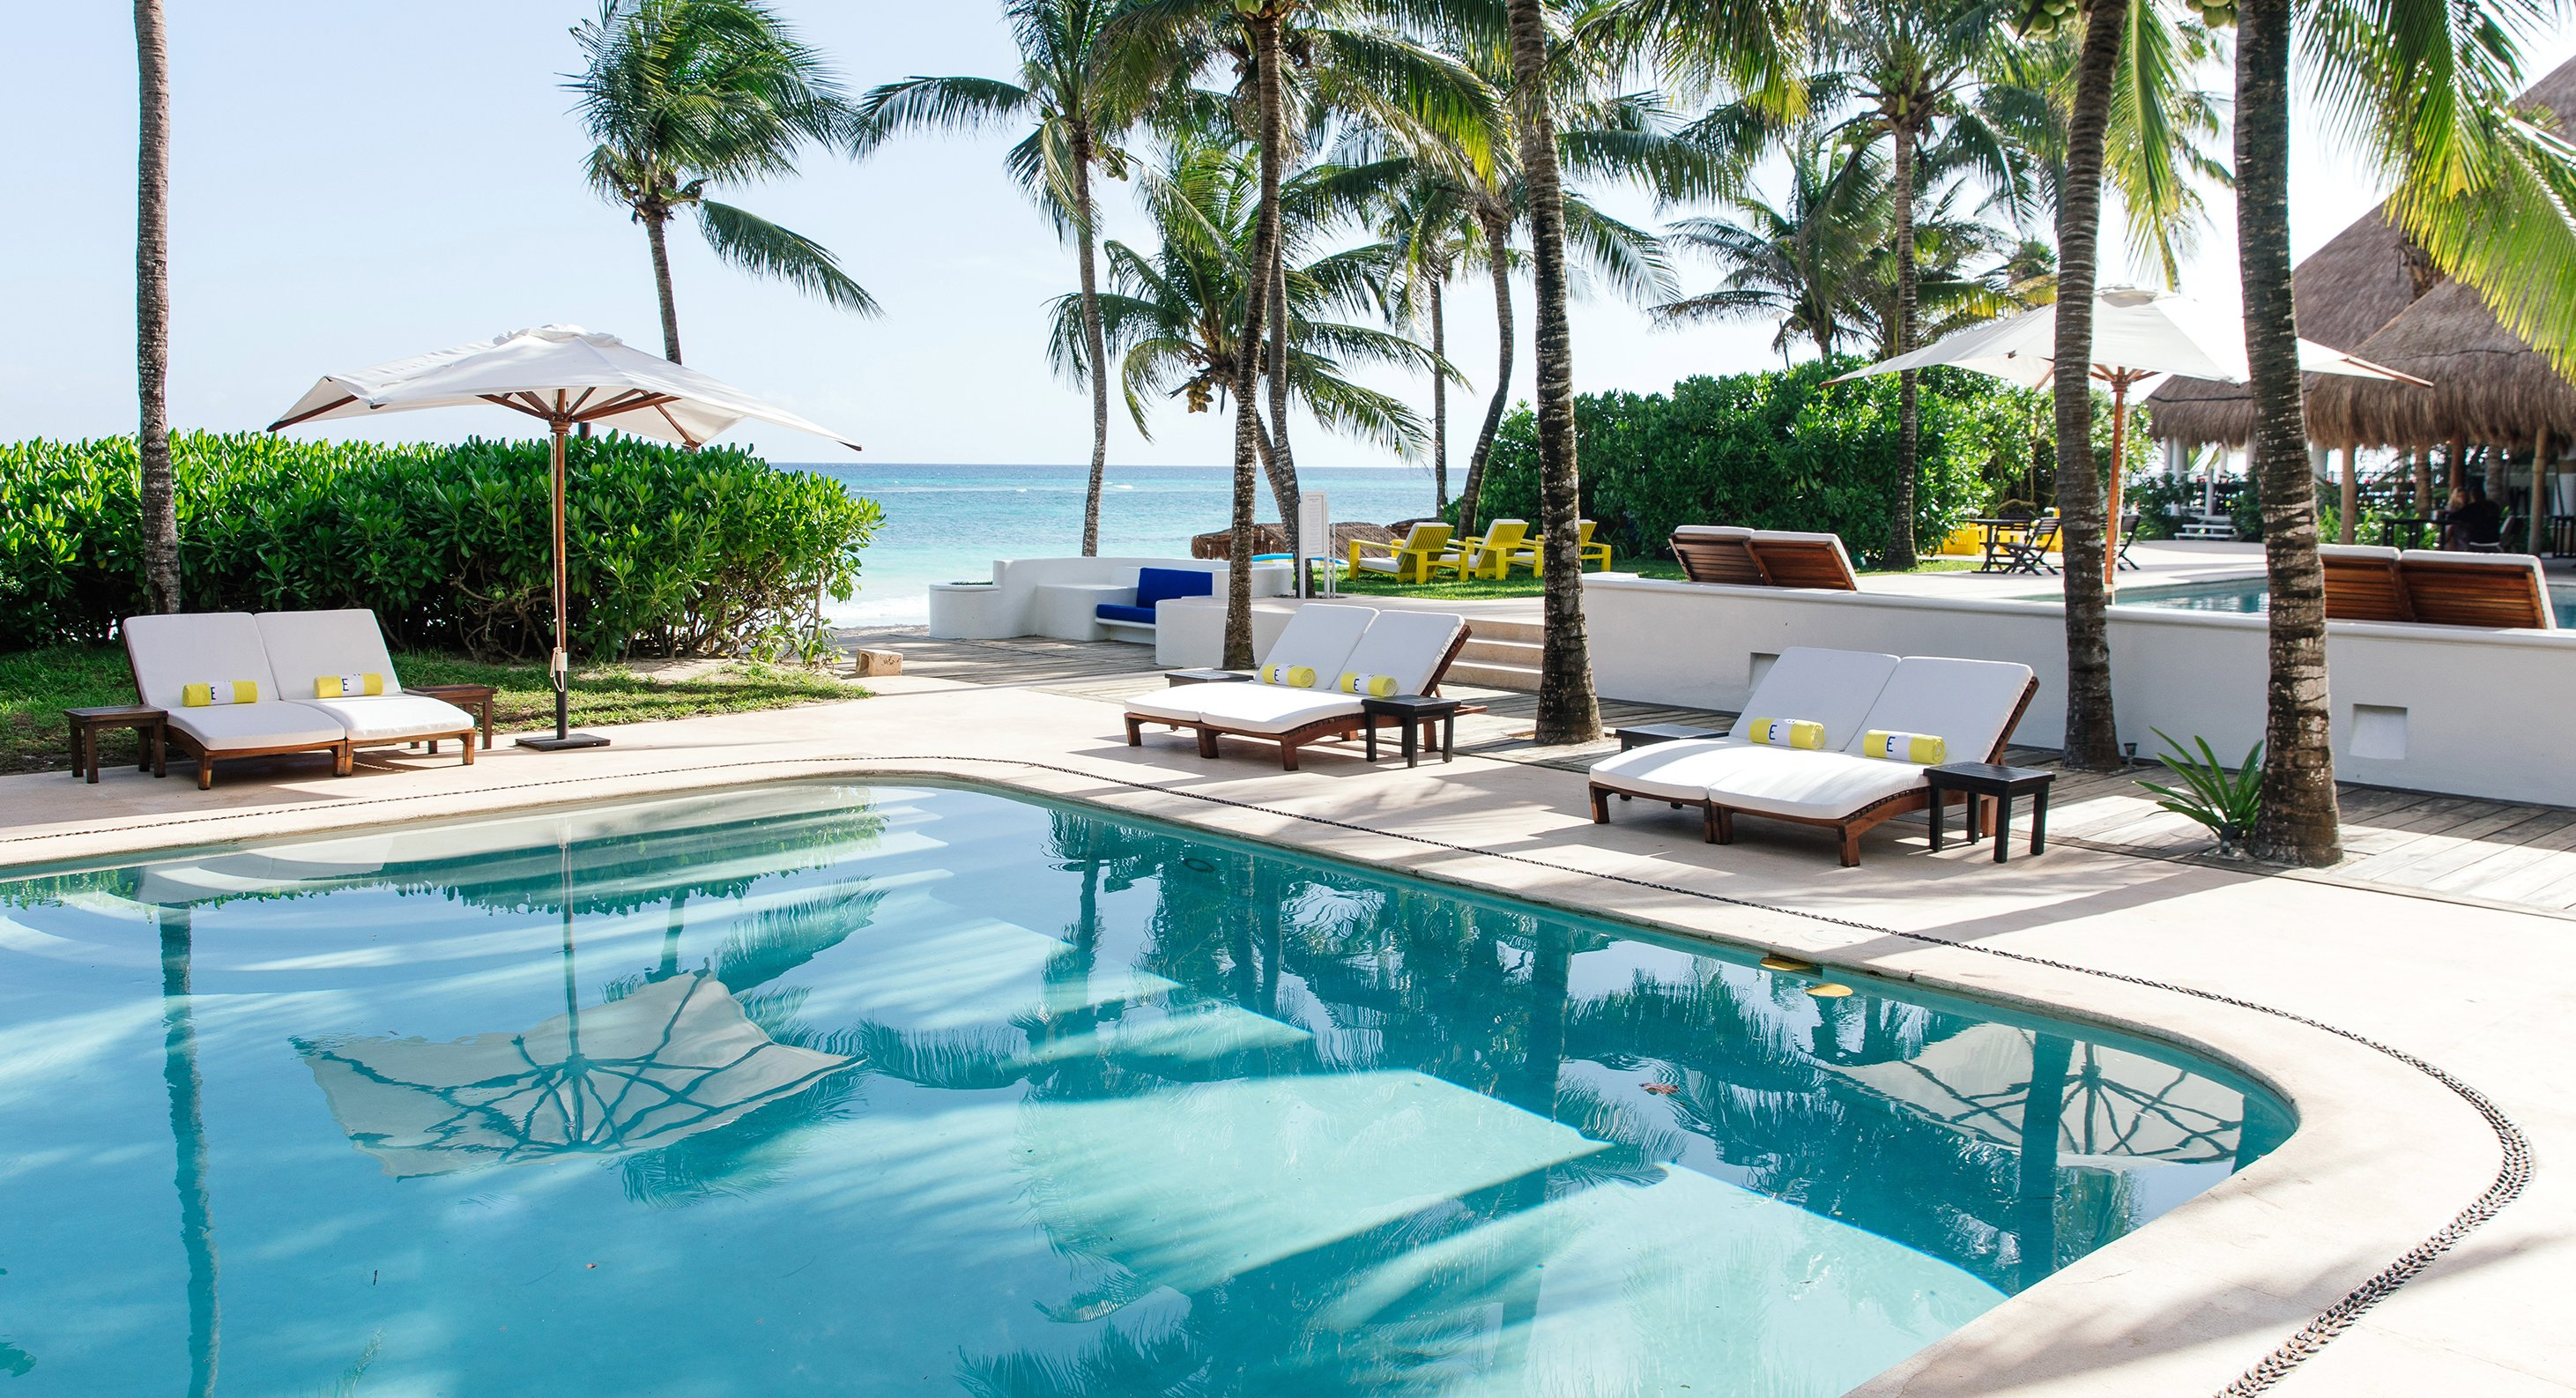 hotel-esencia-riviera-maya-pools